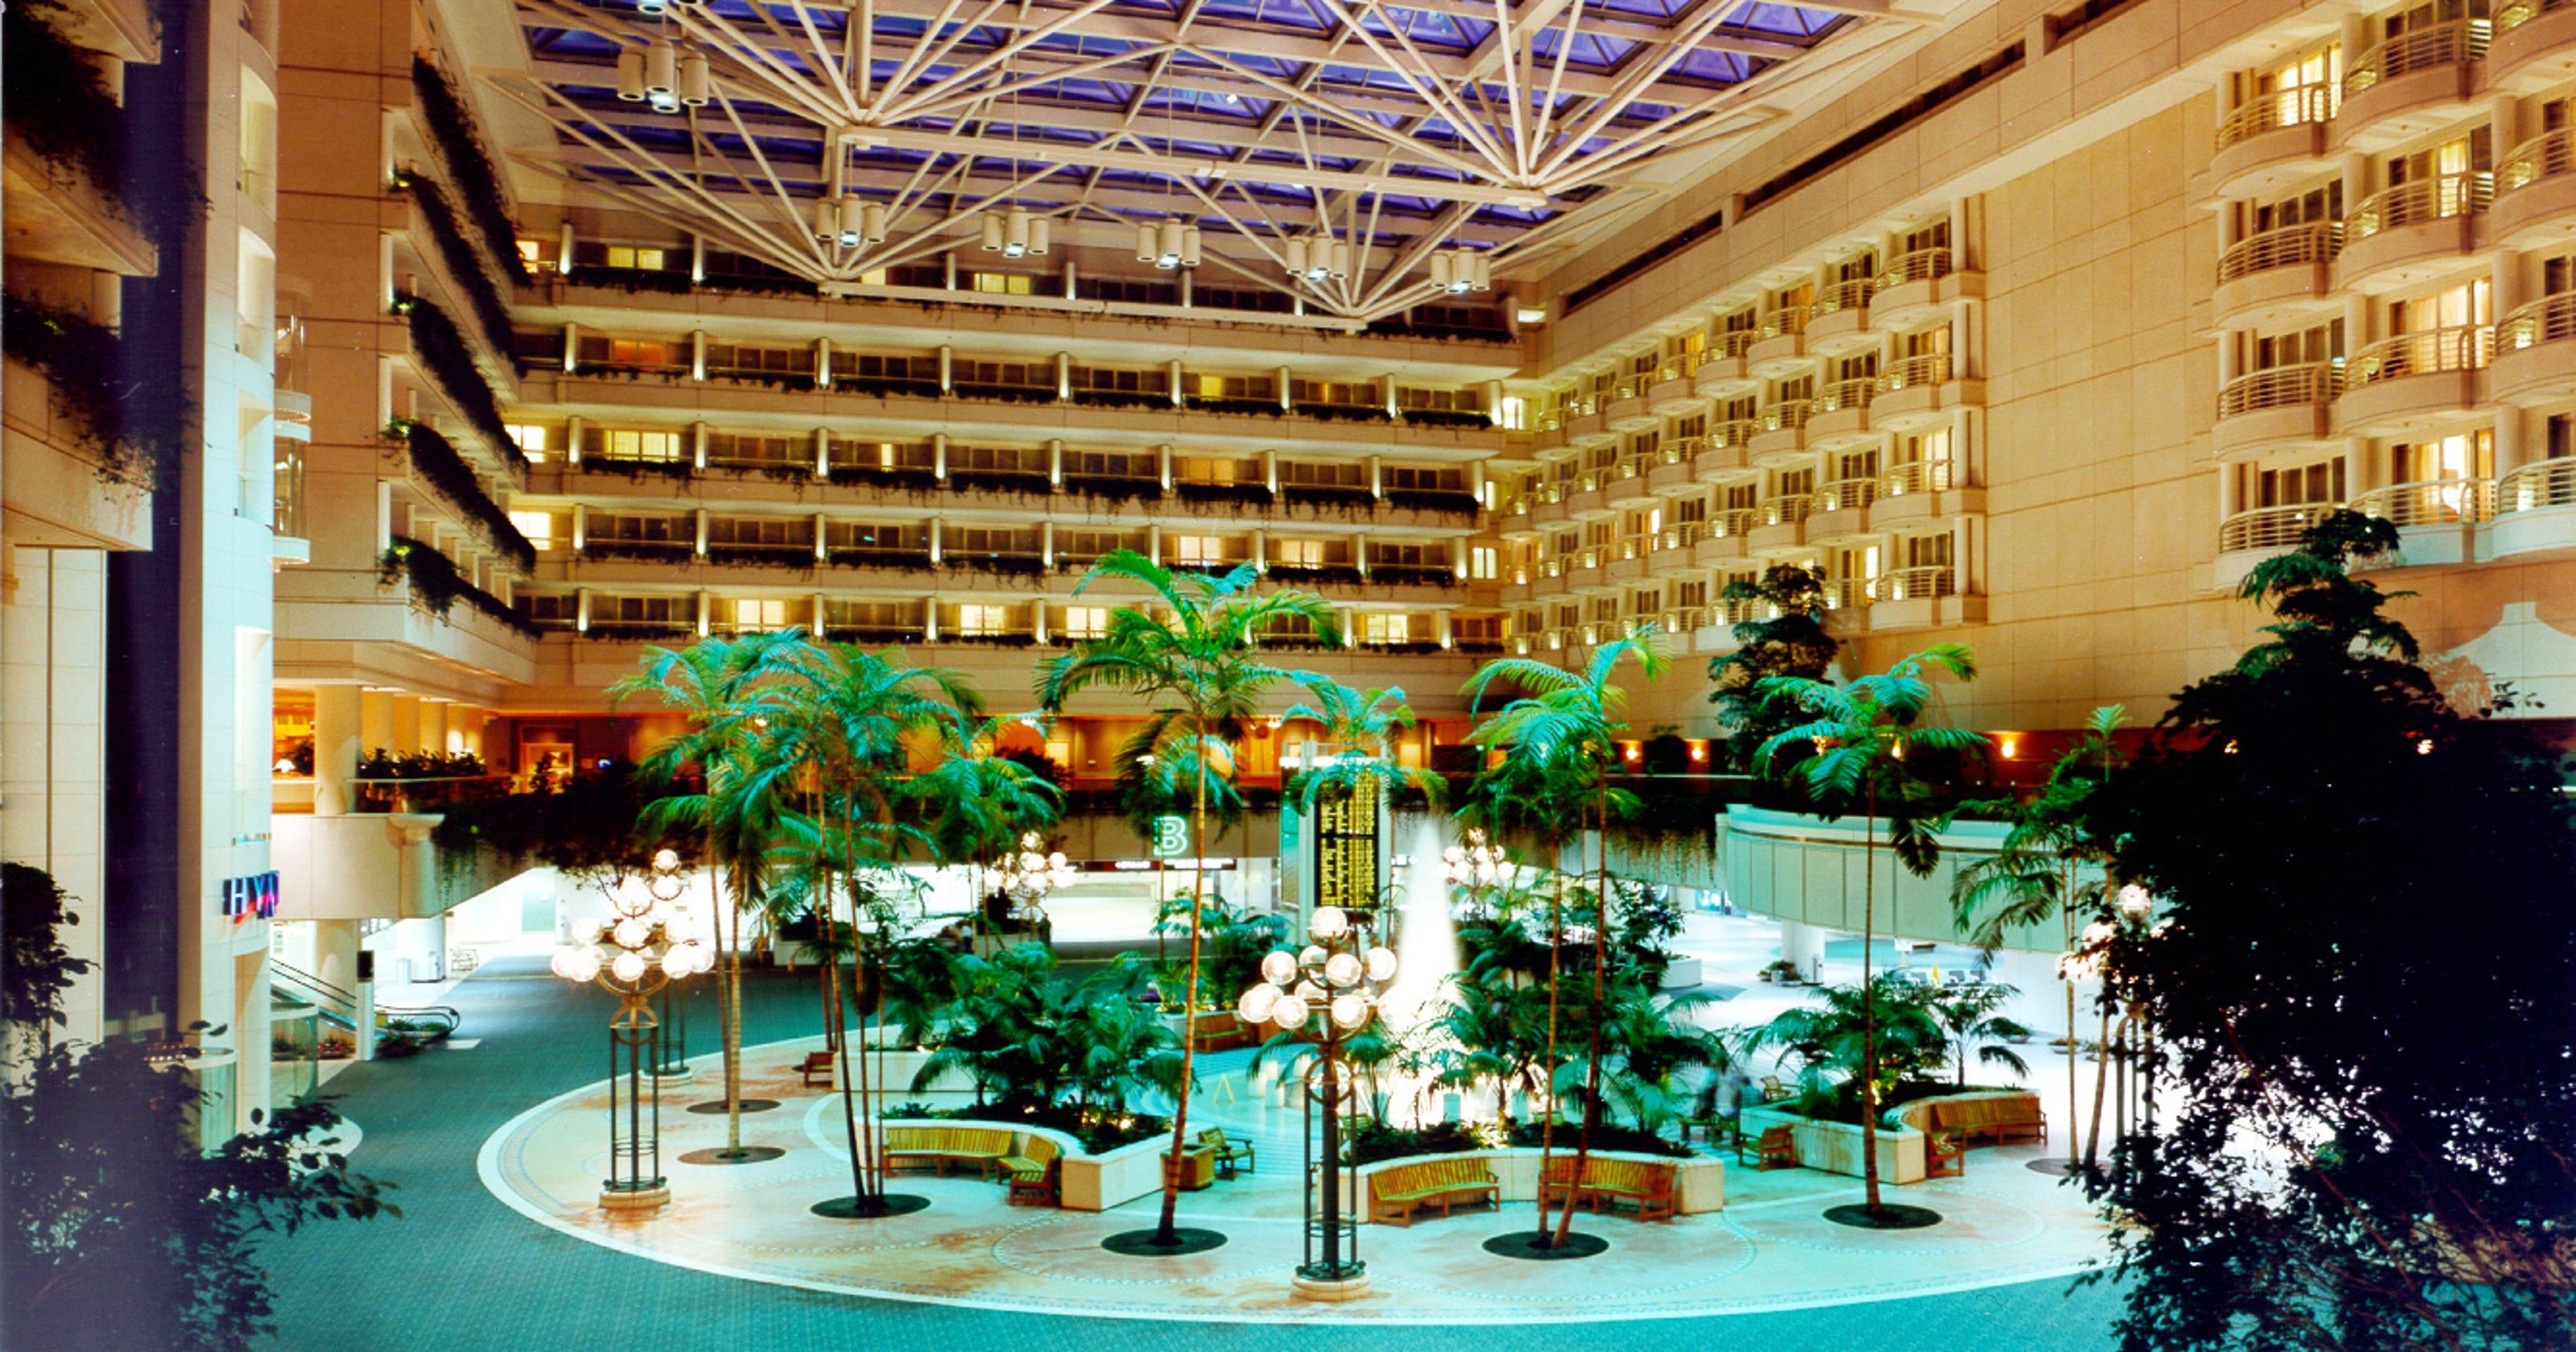 Orlando International Airport Guide